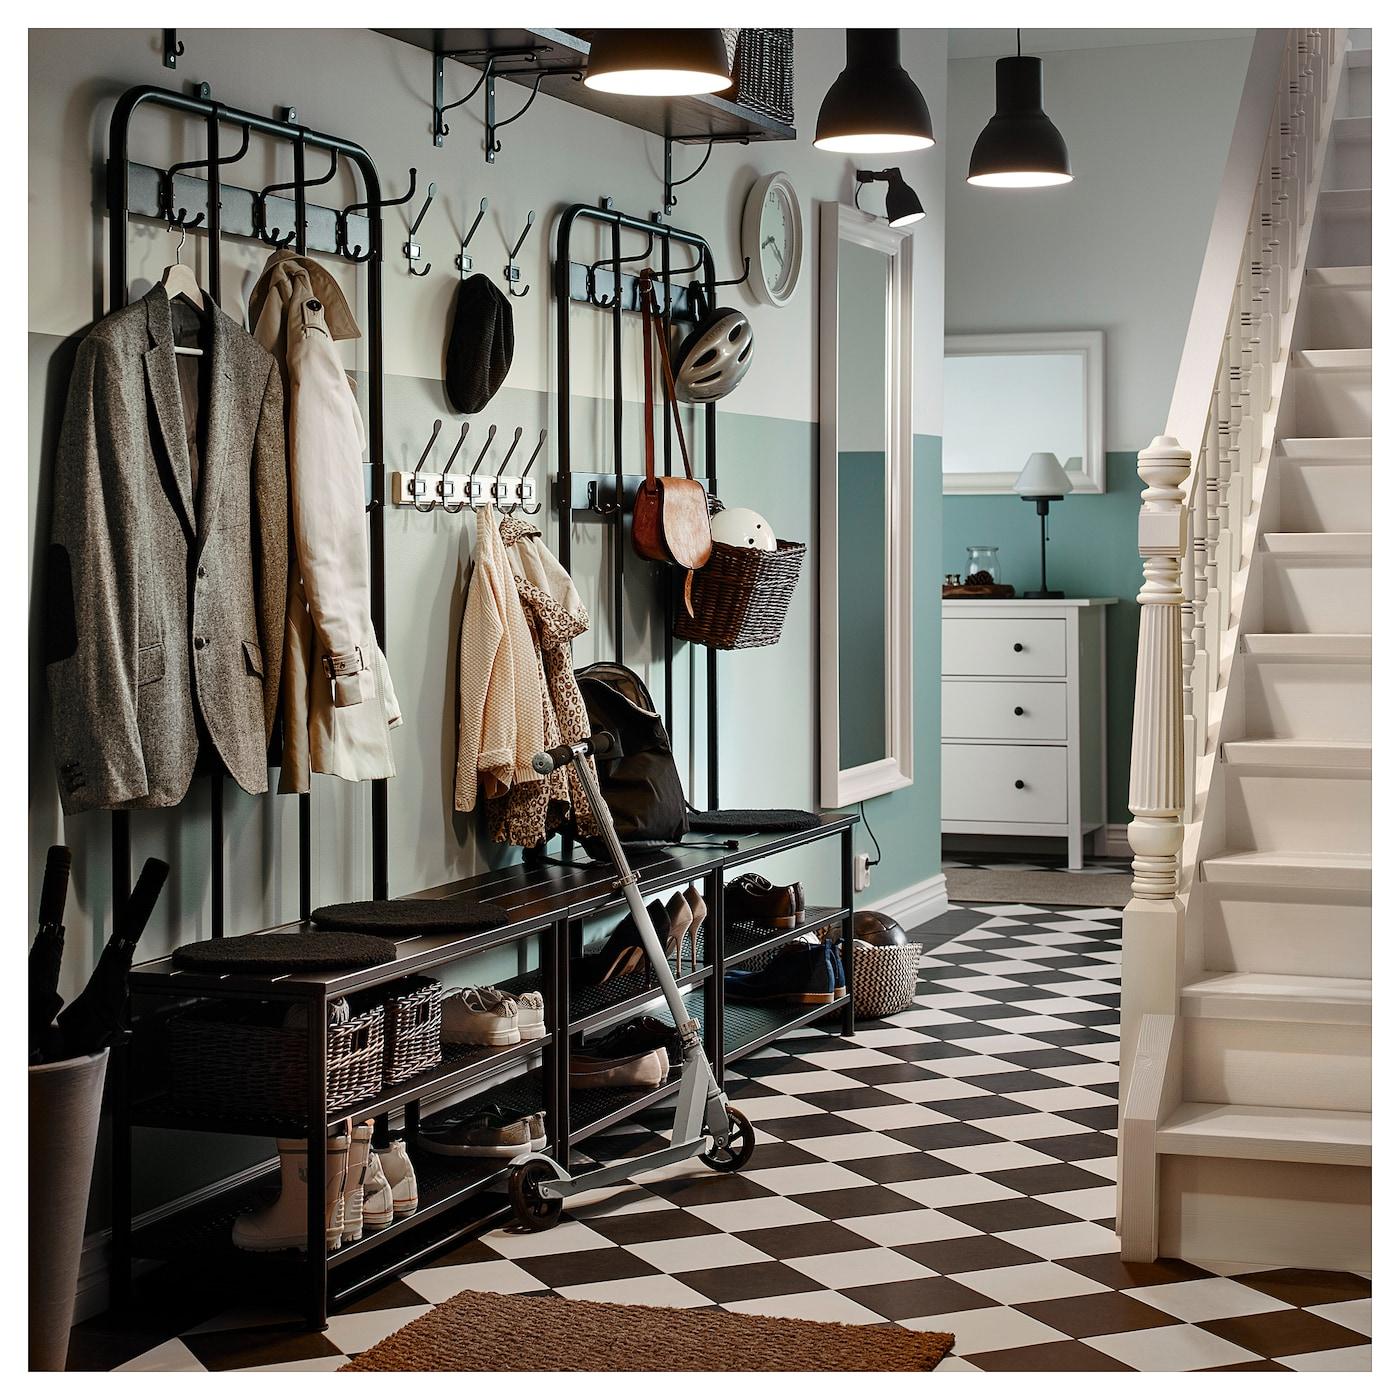 Coat Rack With Shoe Storage: PINNIG Coat Rack With Shoe Storage Bench Black 193 Cm